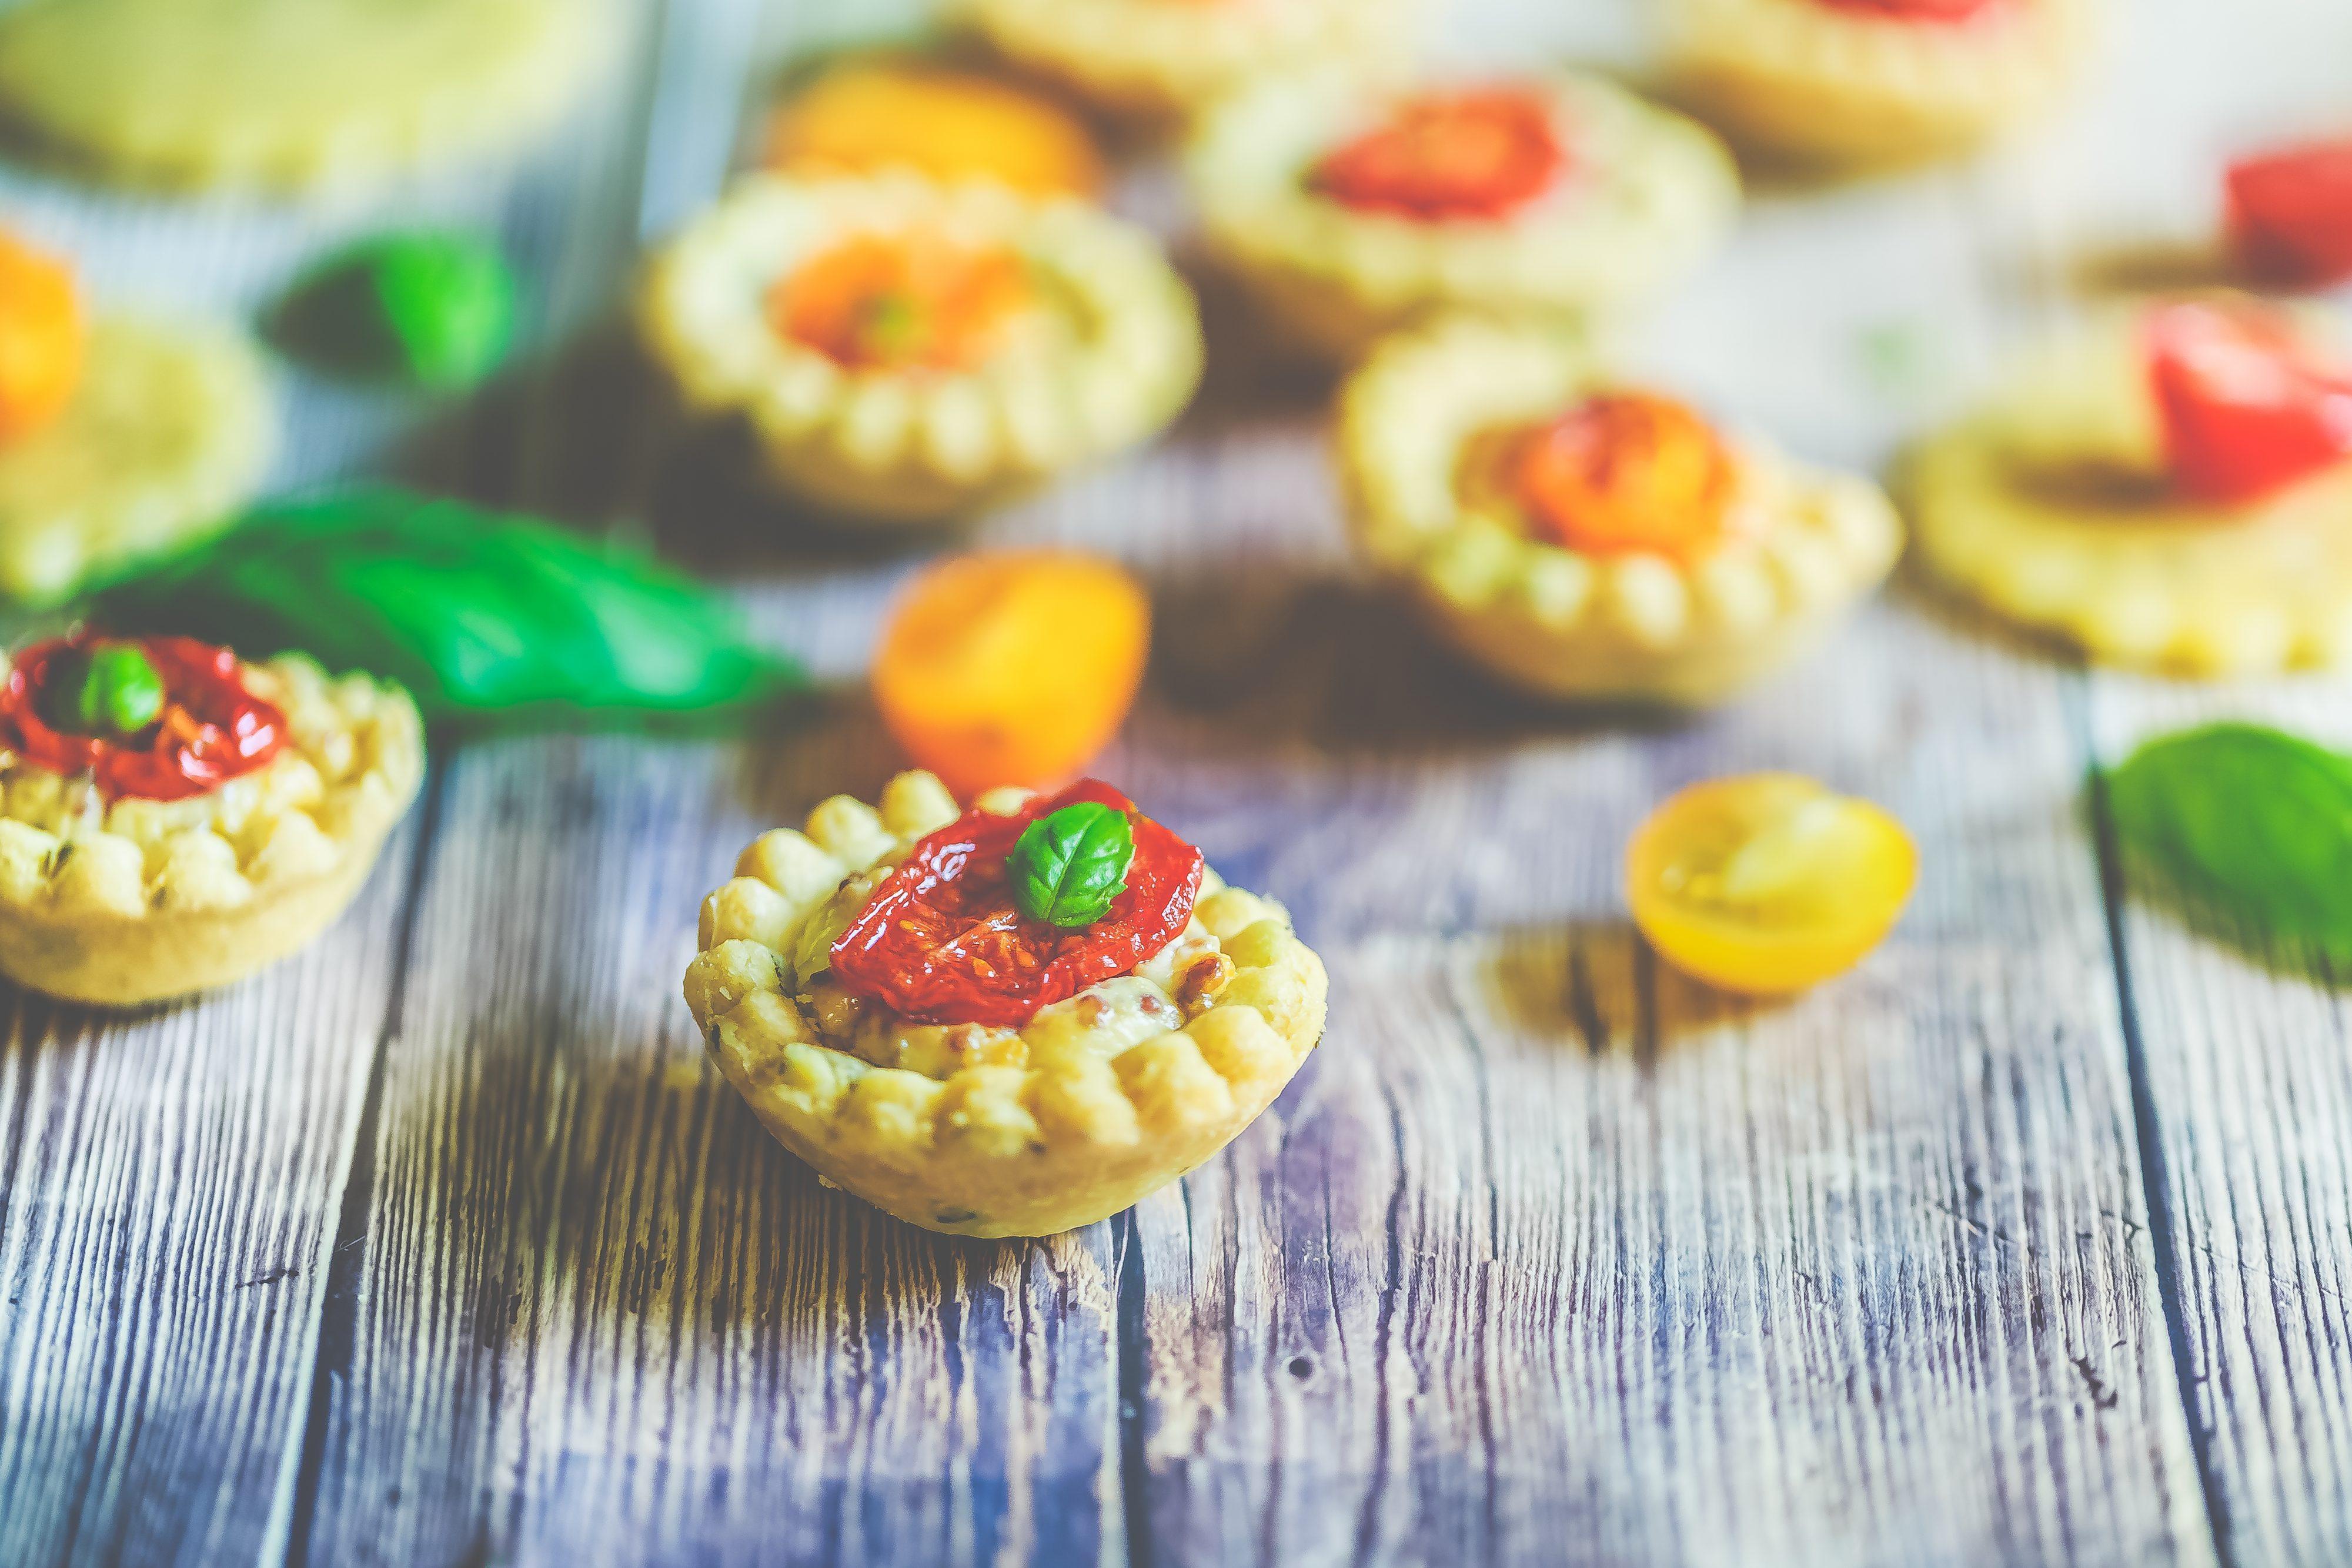 Recette Mini-tartelettes basilic moutarde et tomates cerises